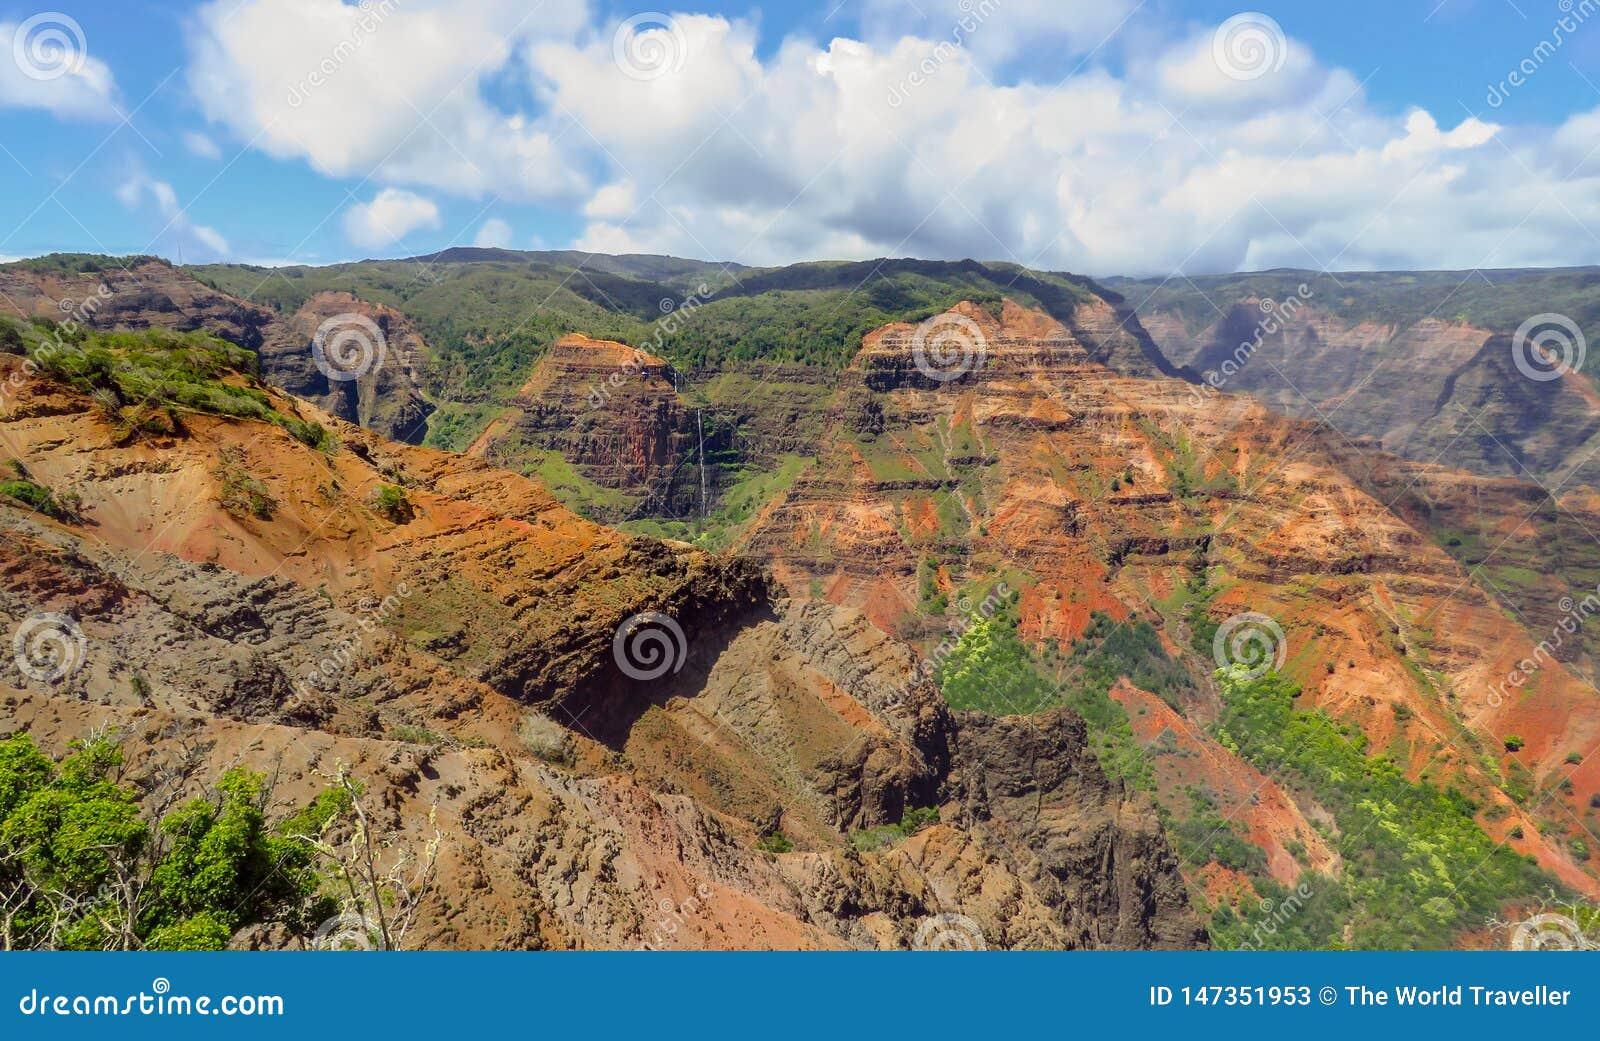 Waipoo Falls lookout at Waimea Canyon, aka the Grand Canyon of the Pacific, Kauai, Hawaii, USA